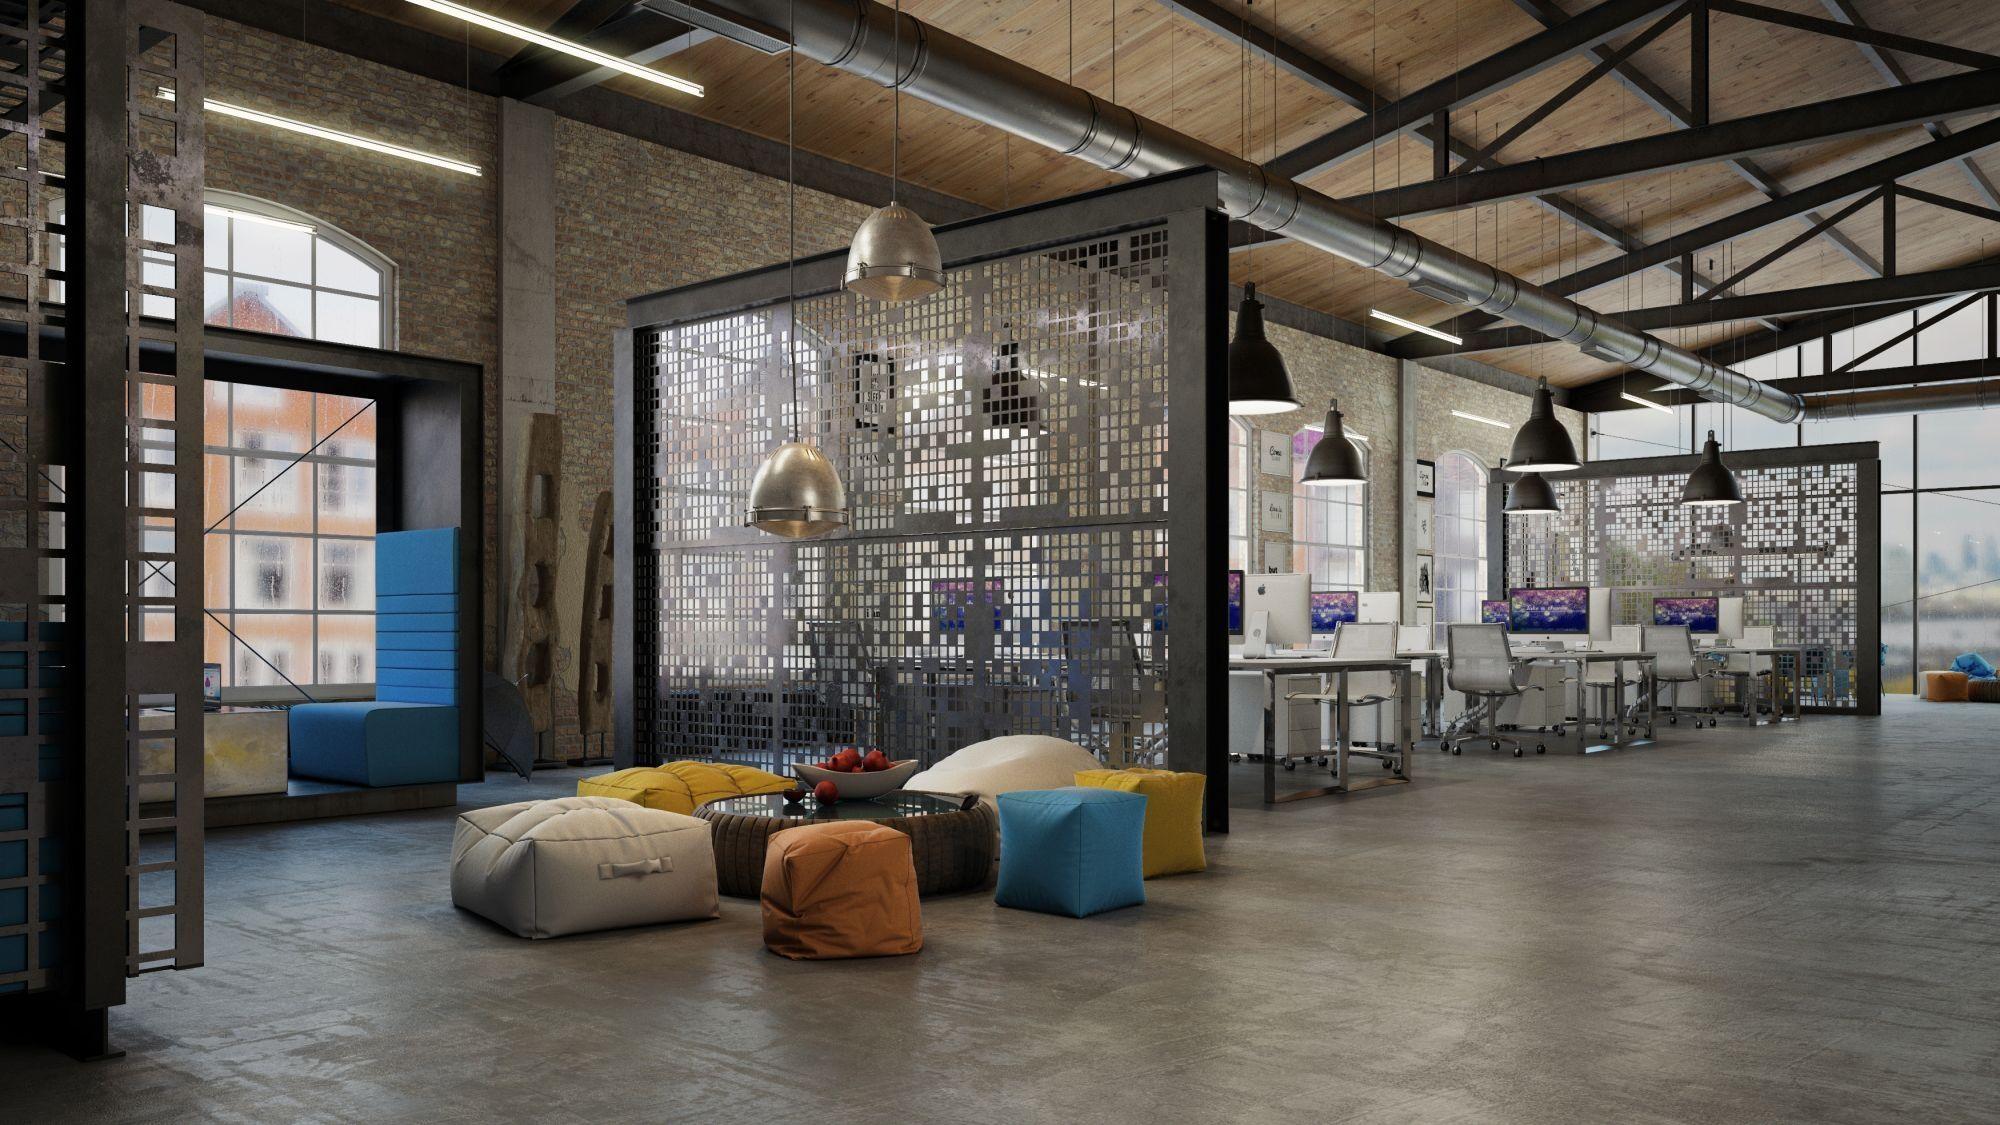 Loft Office Design Loft Office Design Cgarchitect Professional 3d